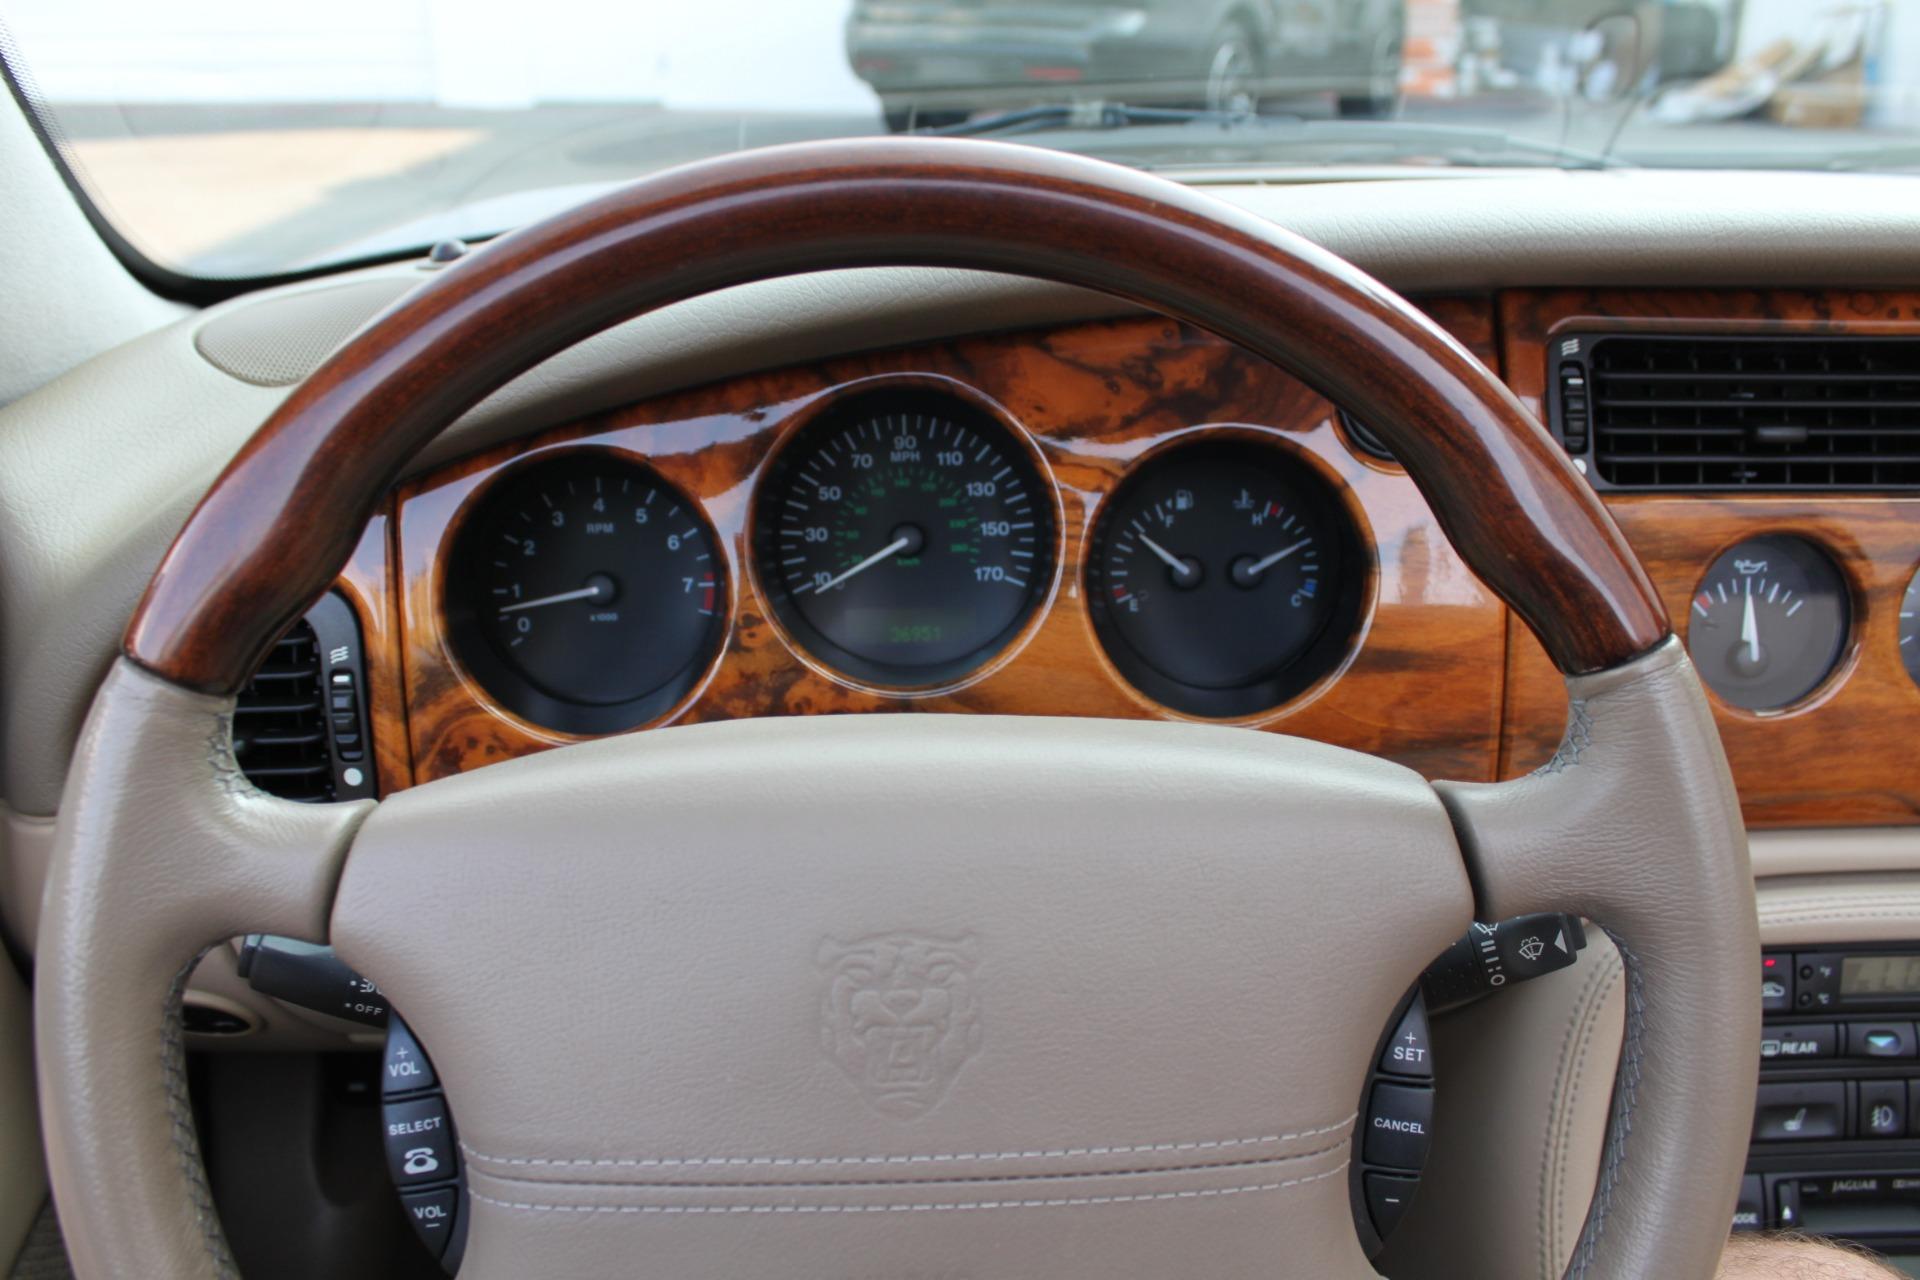 Used-2002-Jaguar-XK8-Convertible-XK8-Land-Rover